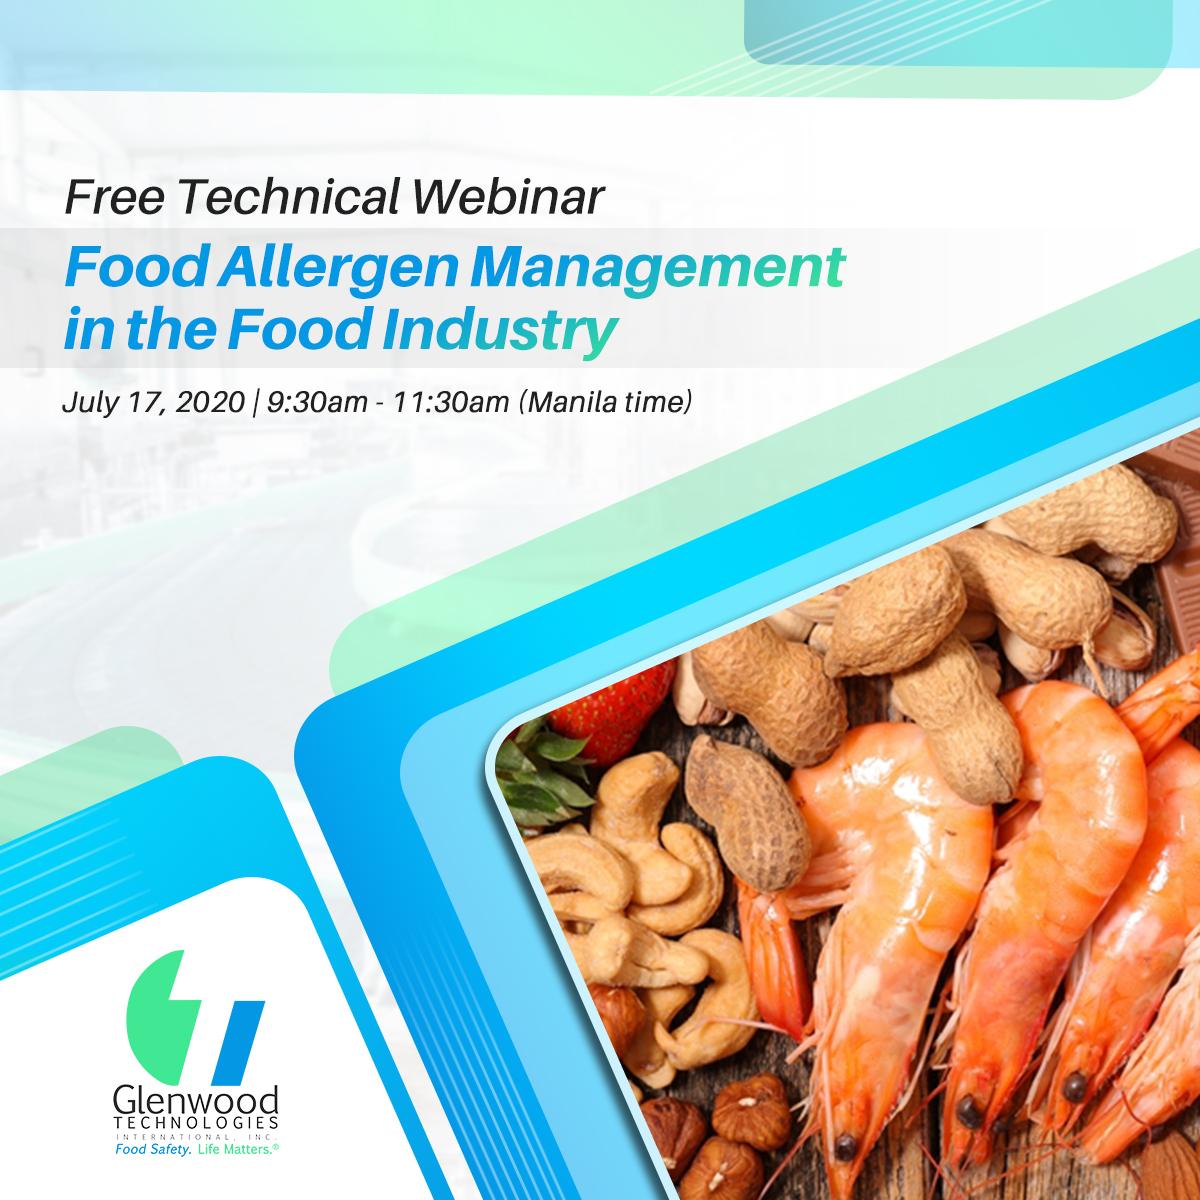 Webinar: Food Allergen Management in the Food Industry